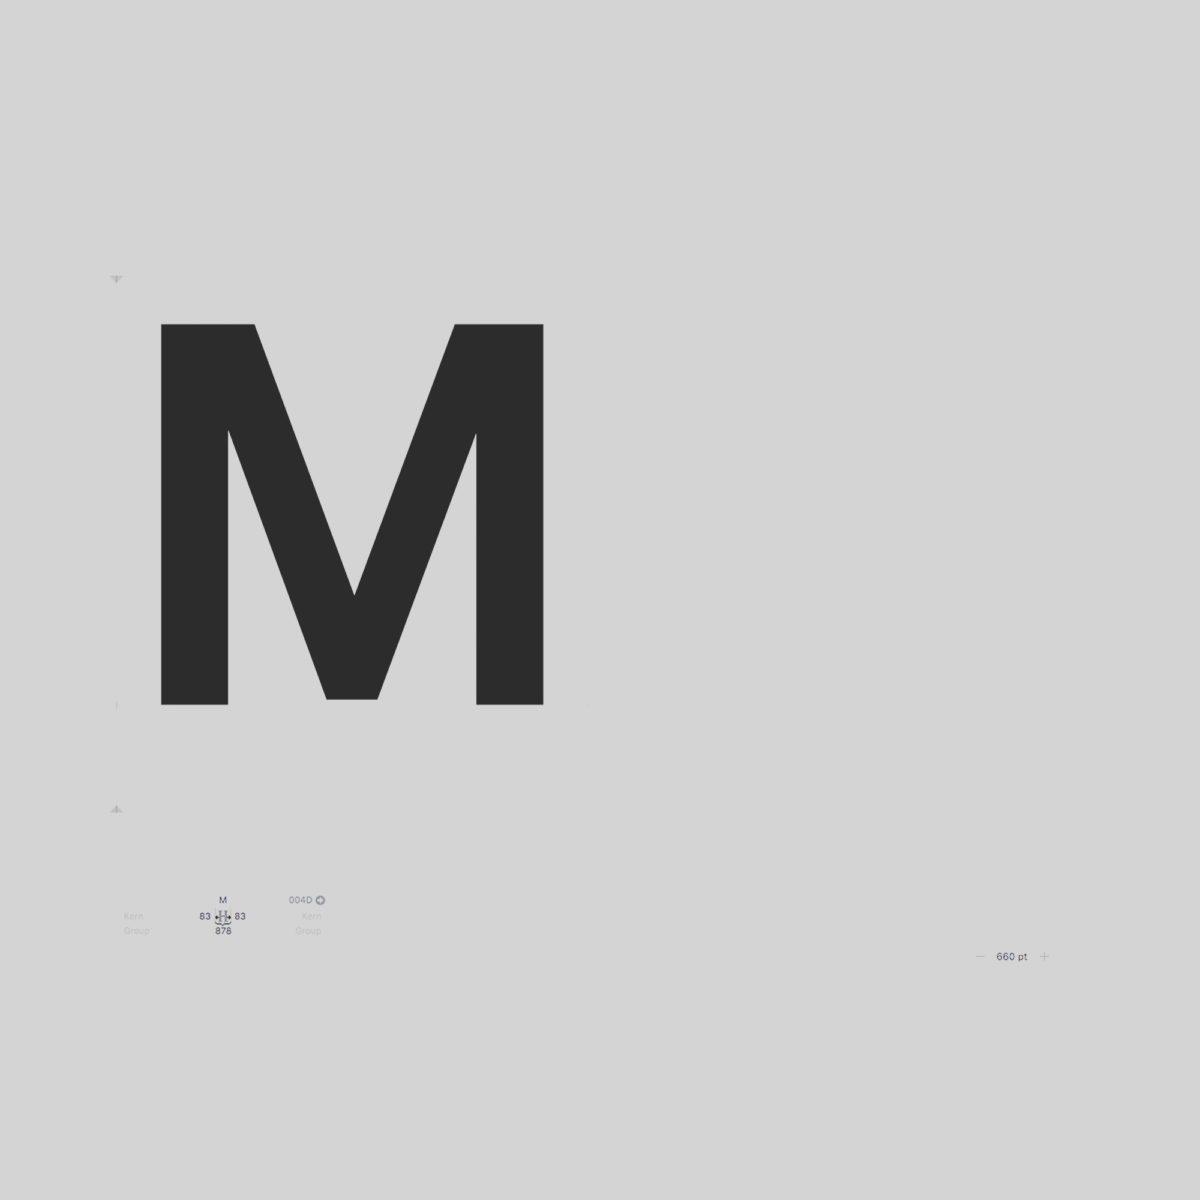 Work In Progress — Type.M.#graphics #design #agencylife #graphicdesigner #graphicdesign #igers #igersoftheday #designer #graphicdesign #art #artdirection  #grafik #Branding #brandingagency #Brand #grey #type #typeography #font #typography